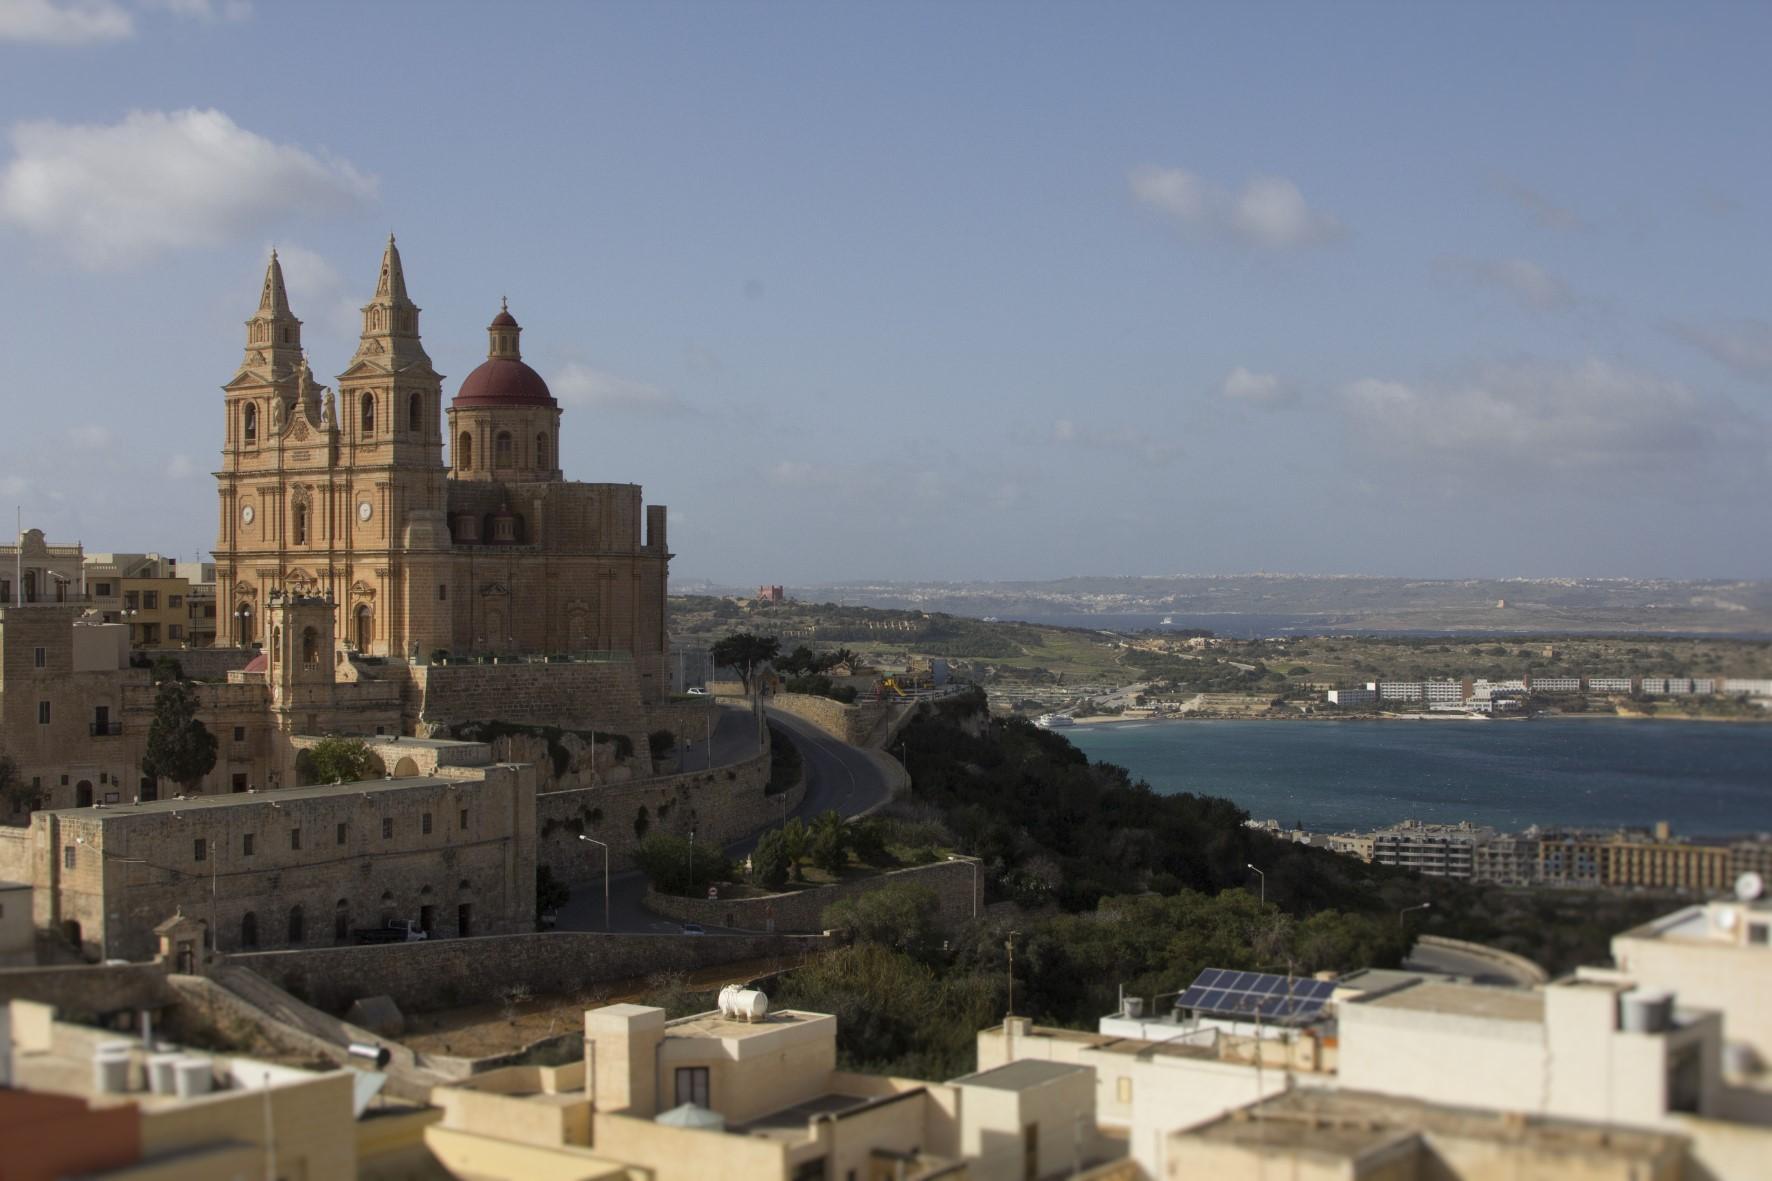 Mellieha parish church, Mellieha Bay and Gozo